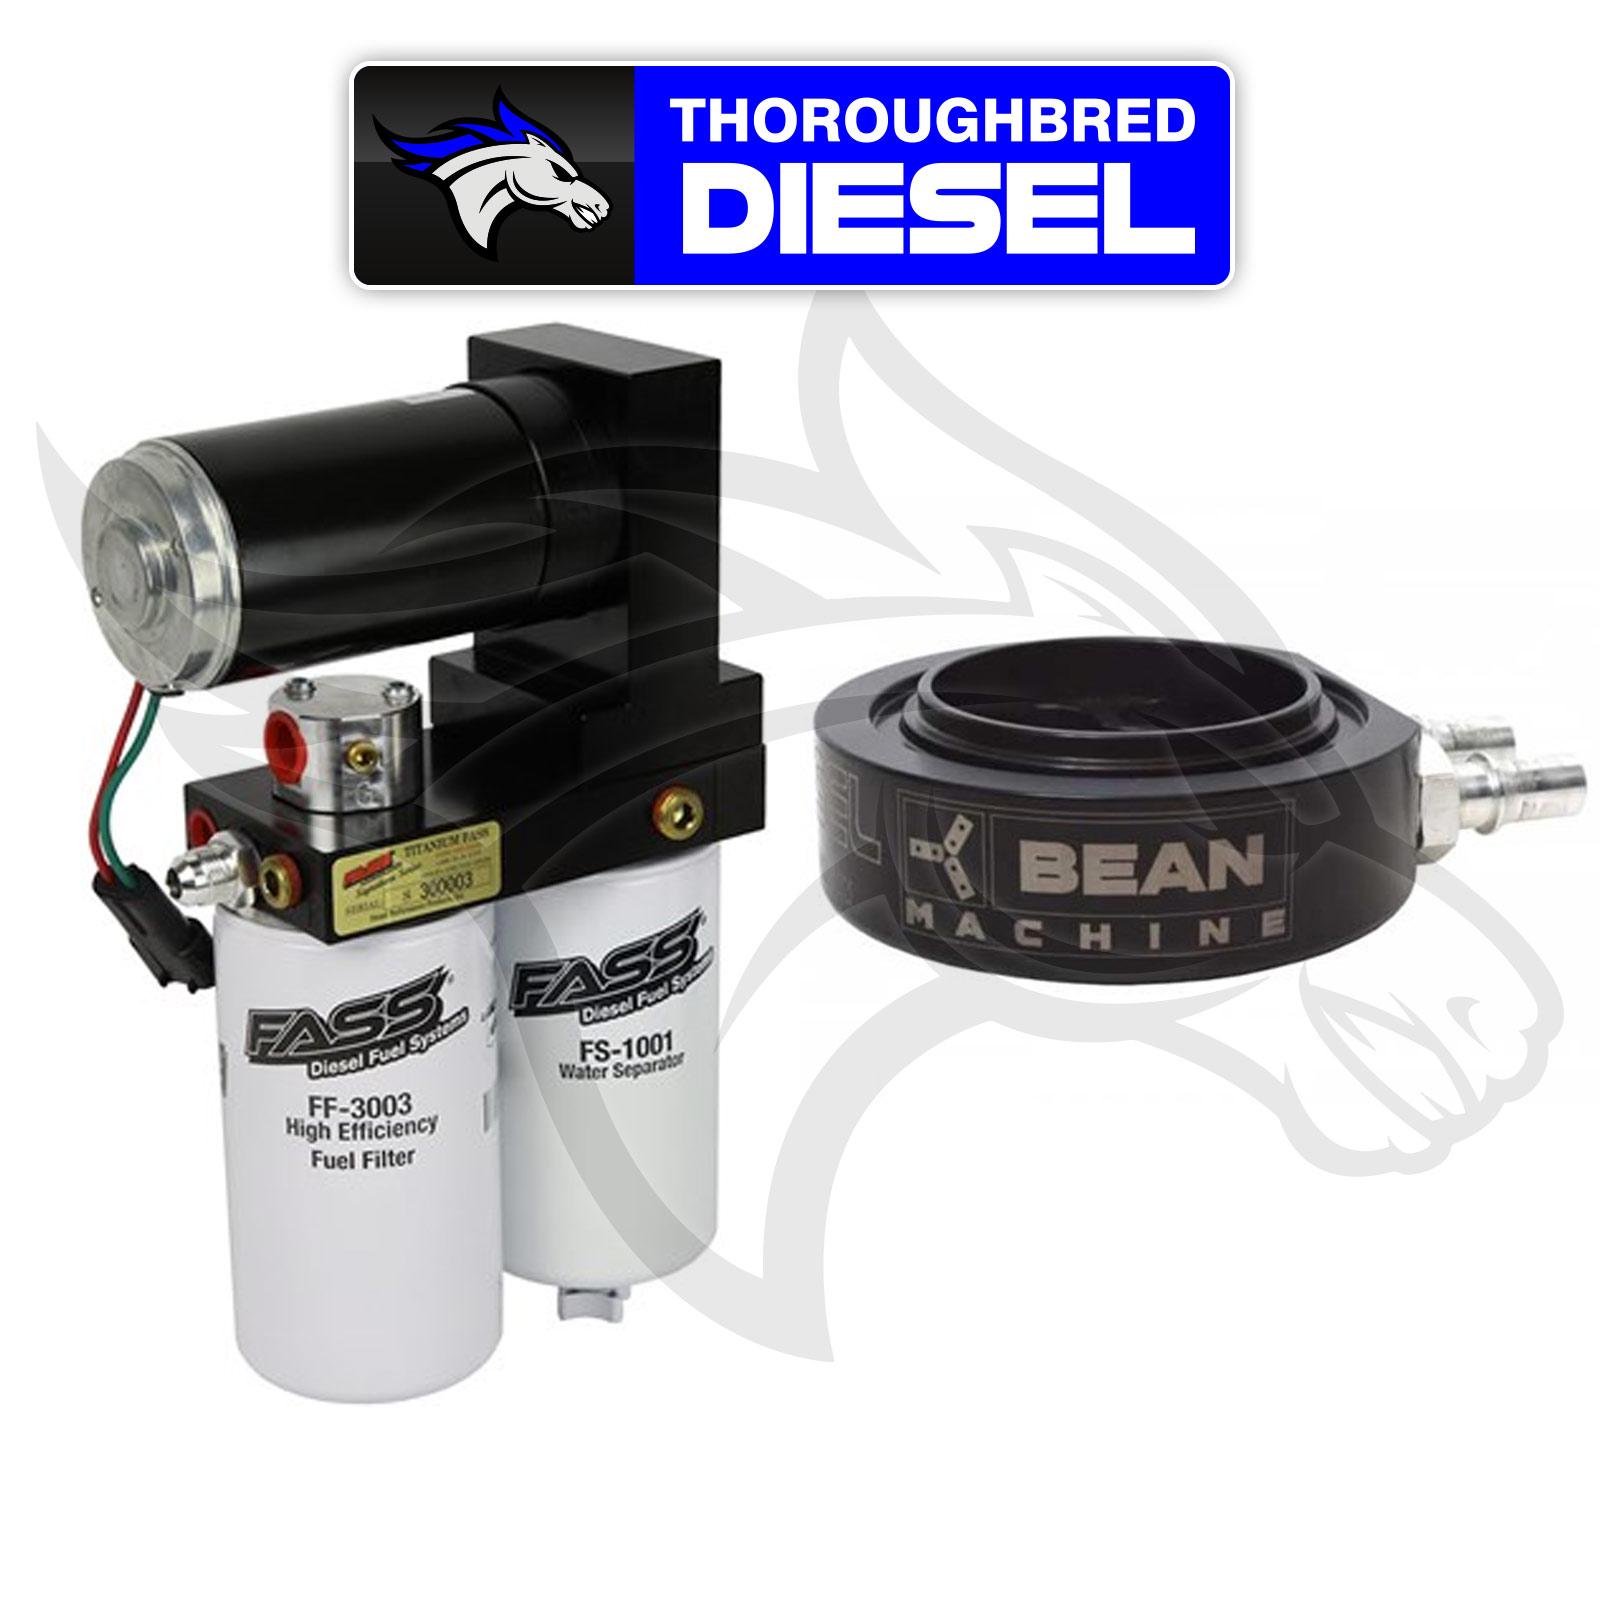 Details about FASS Titanium Signature Series 290 GPH Lift Pump W Beans Sump  For 01-16 Duramax